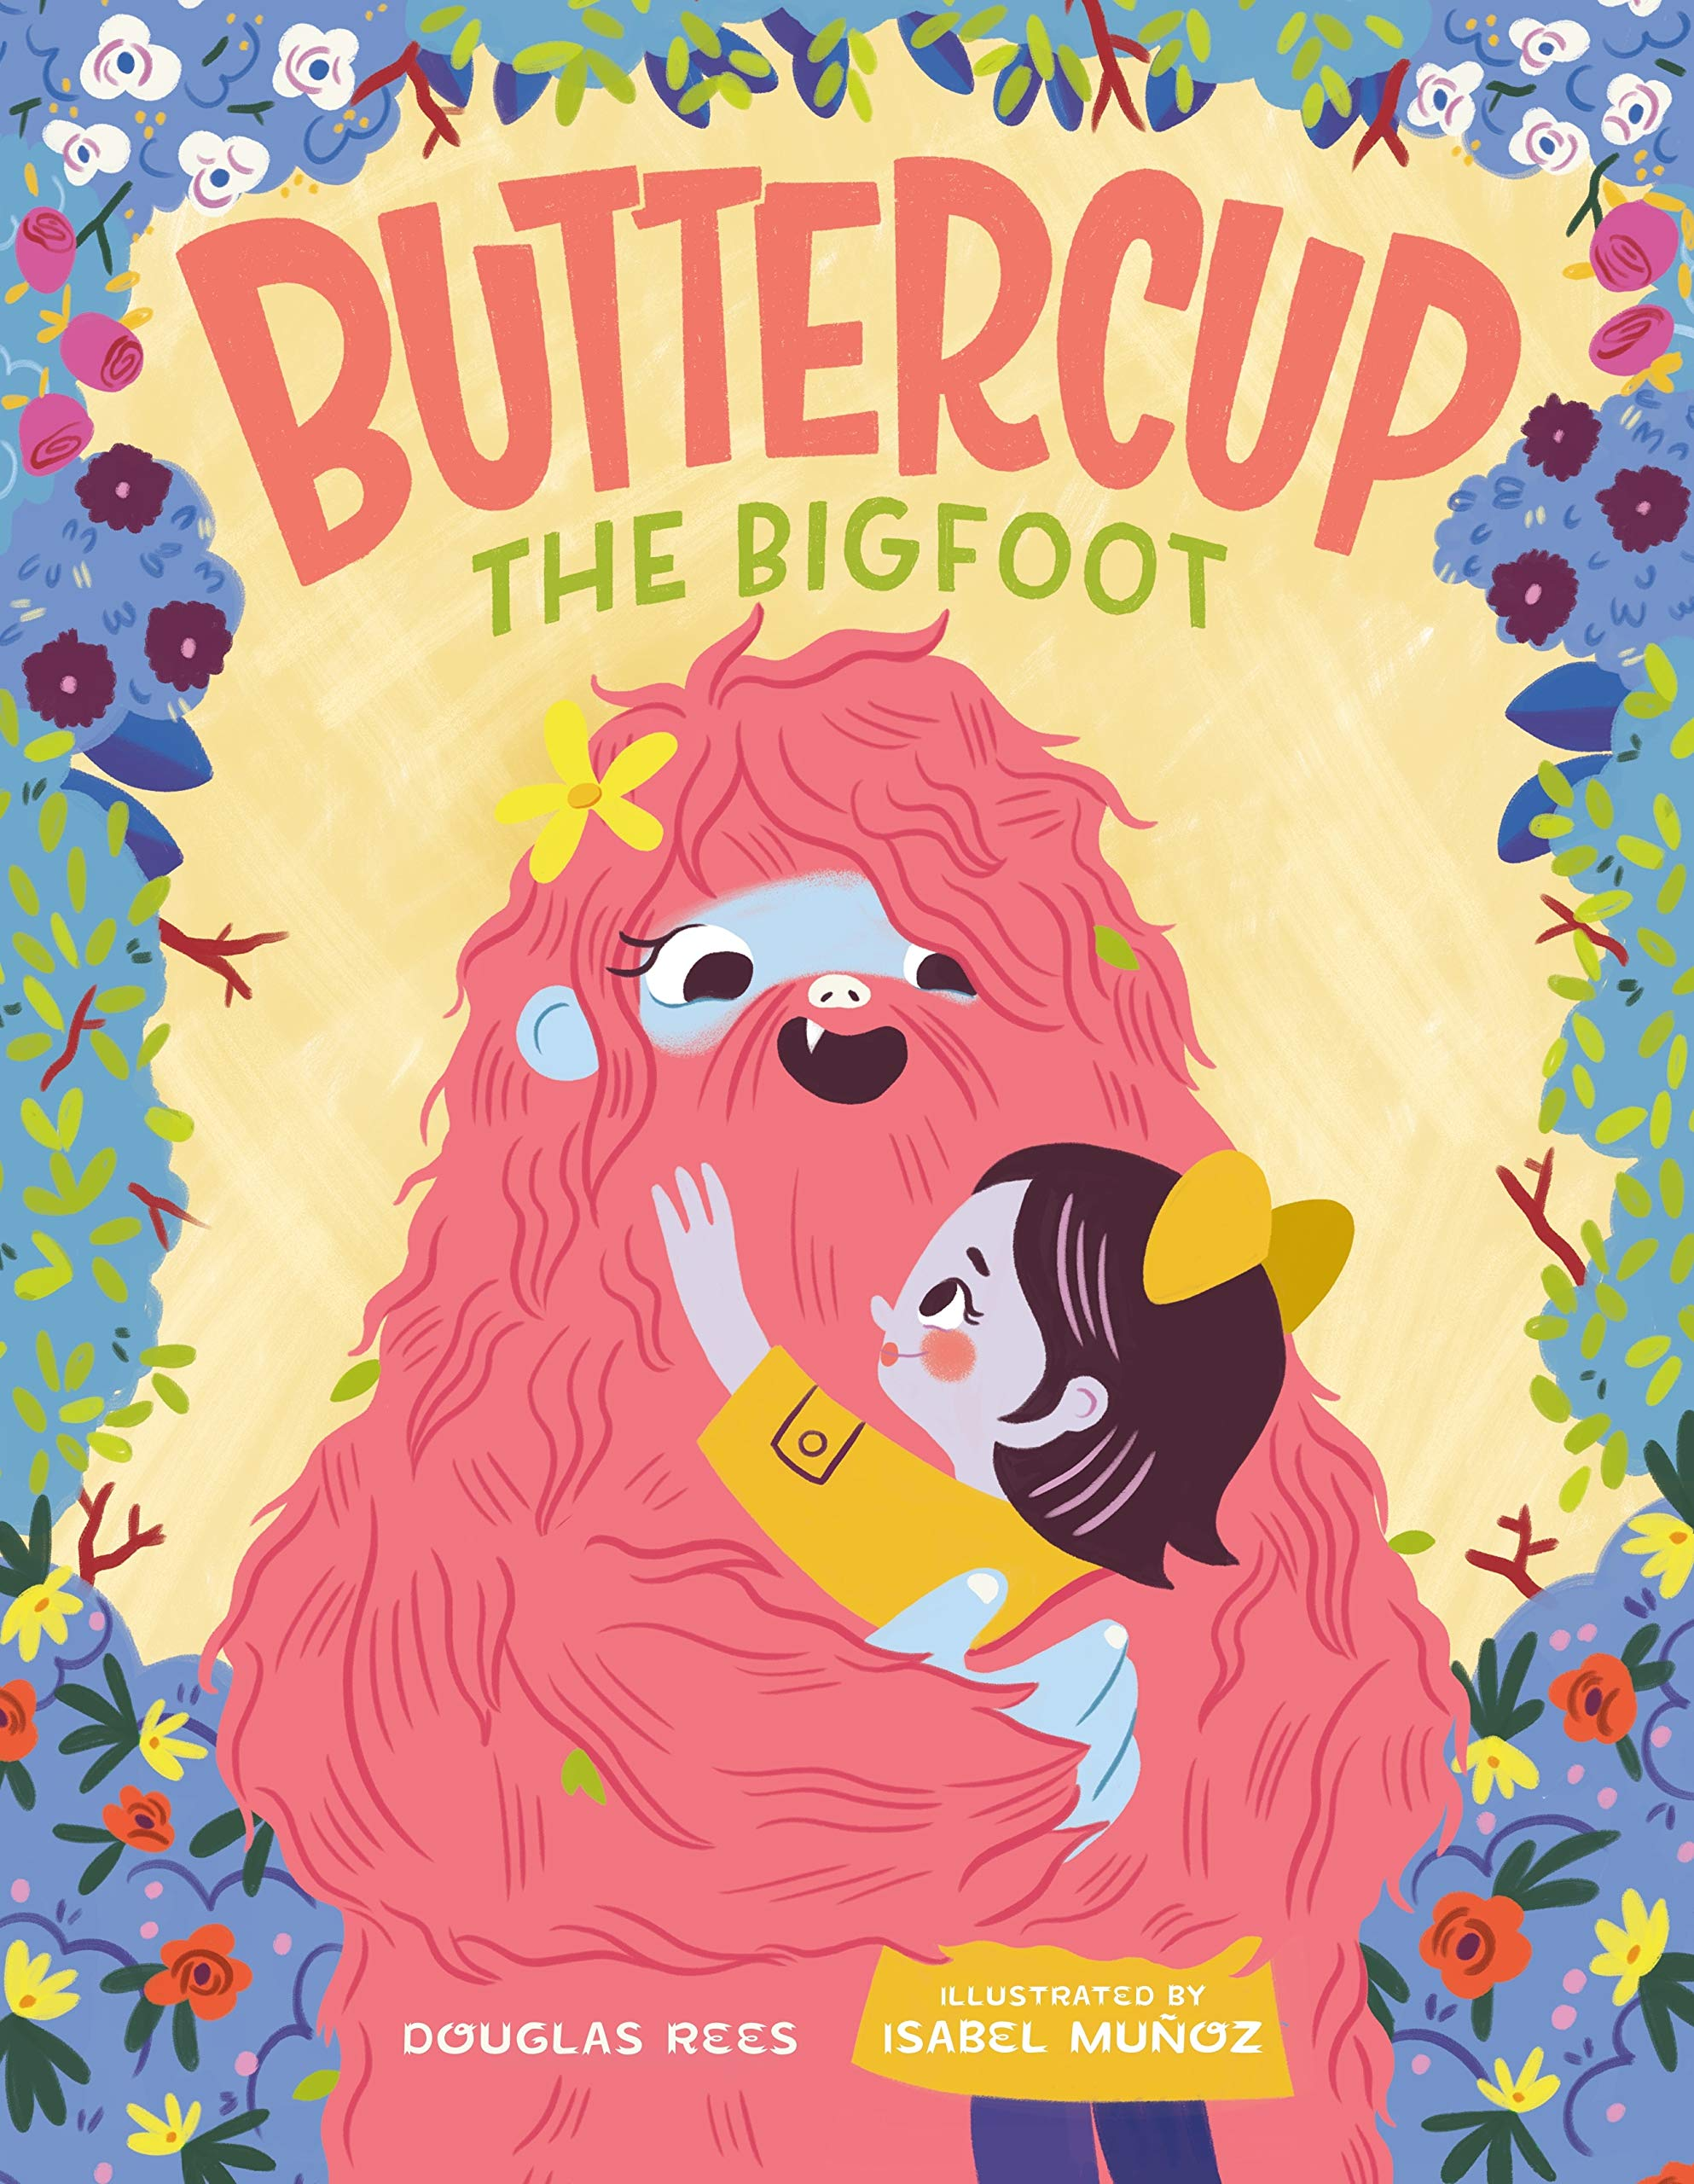 Buttercup the Bigfoot